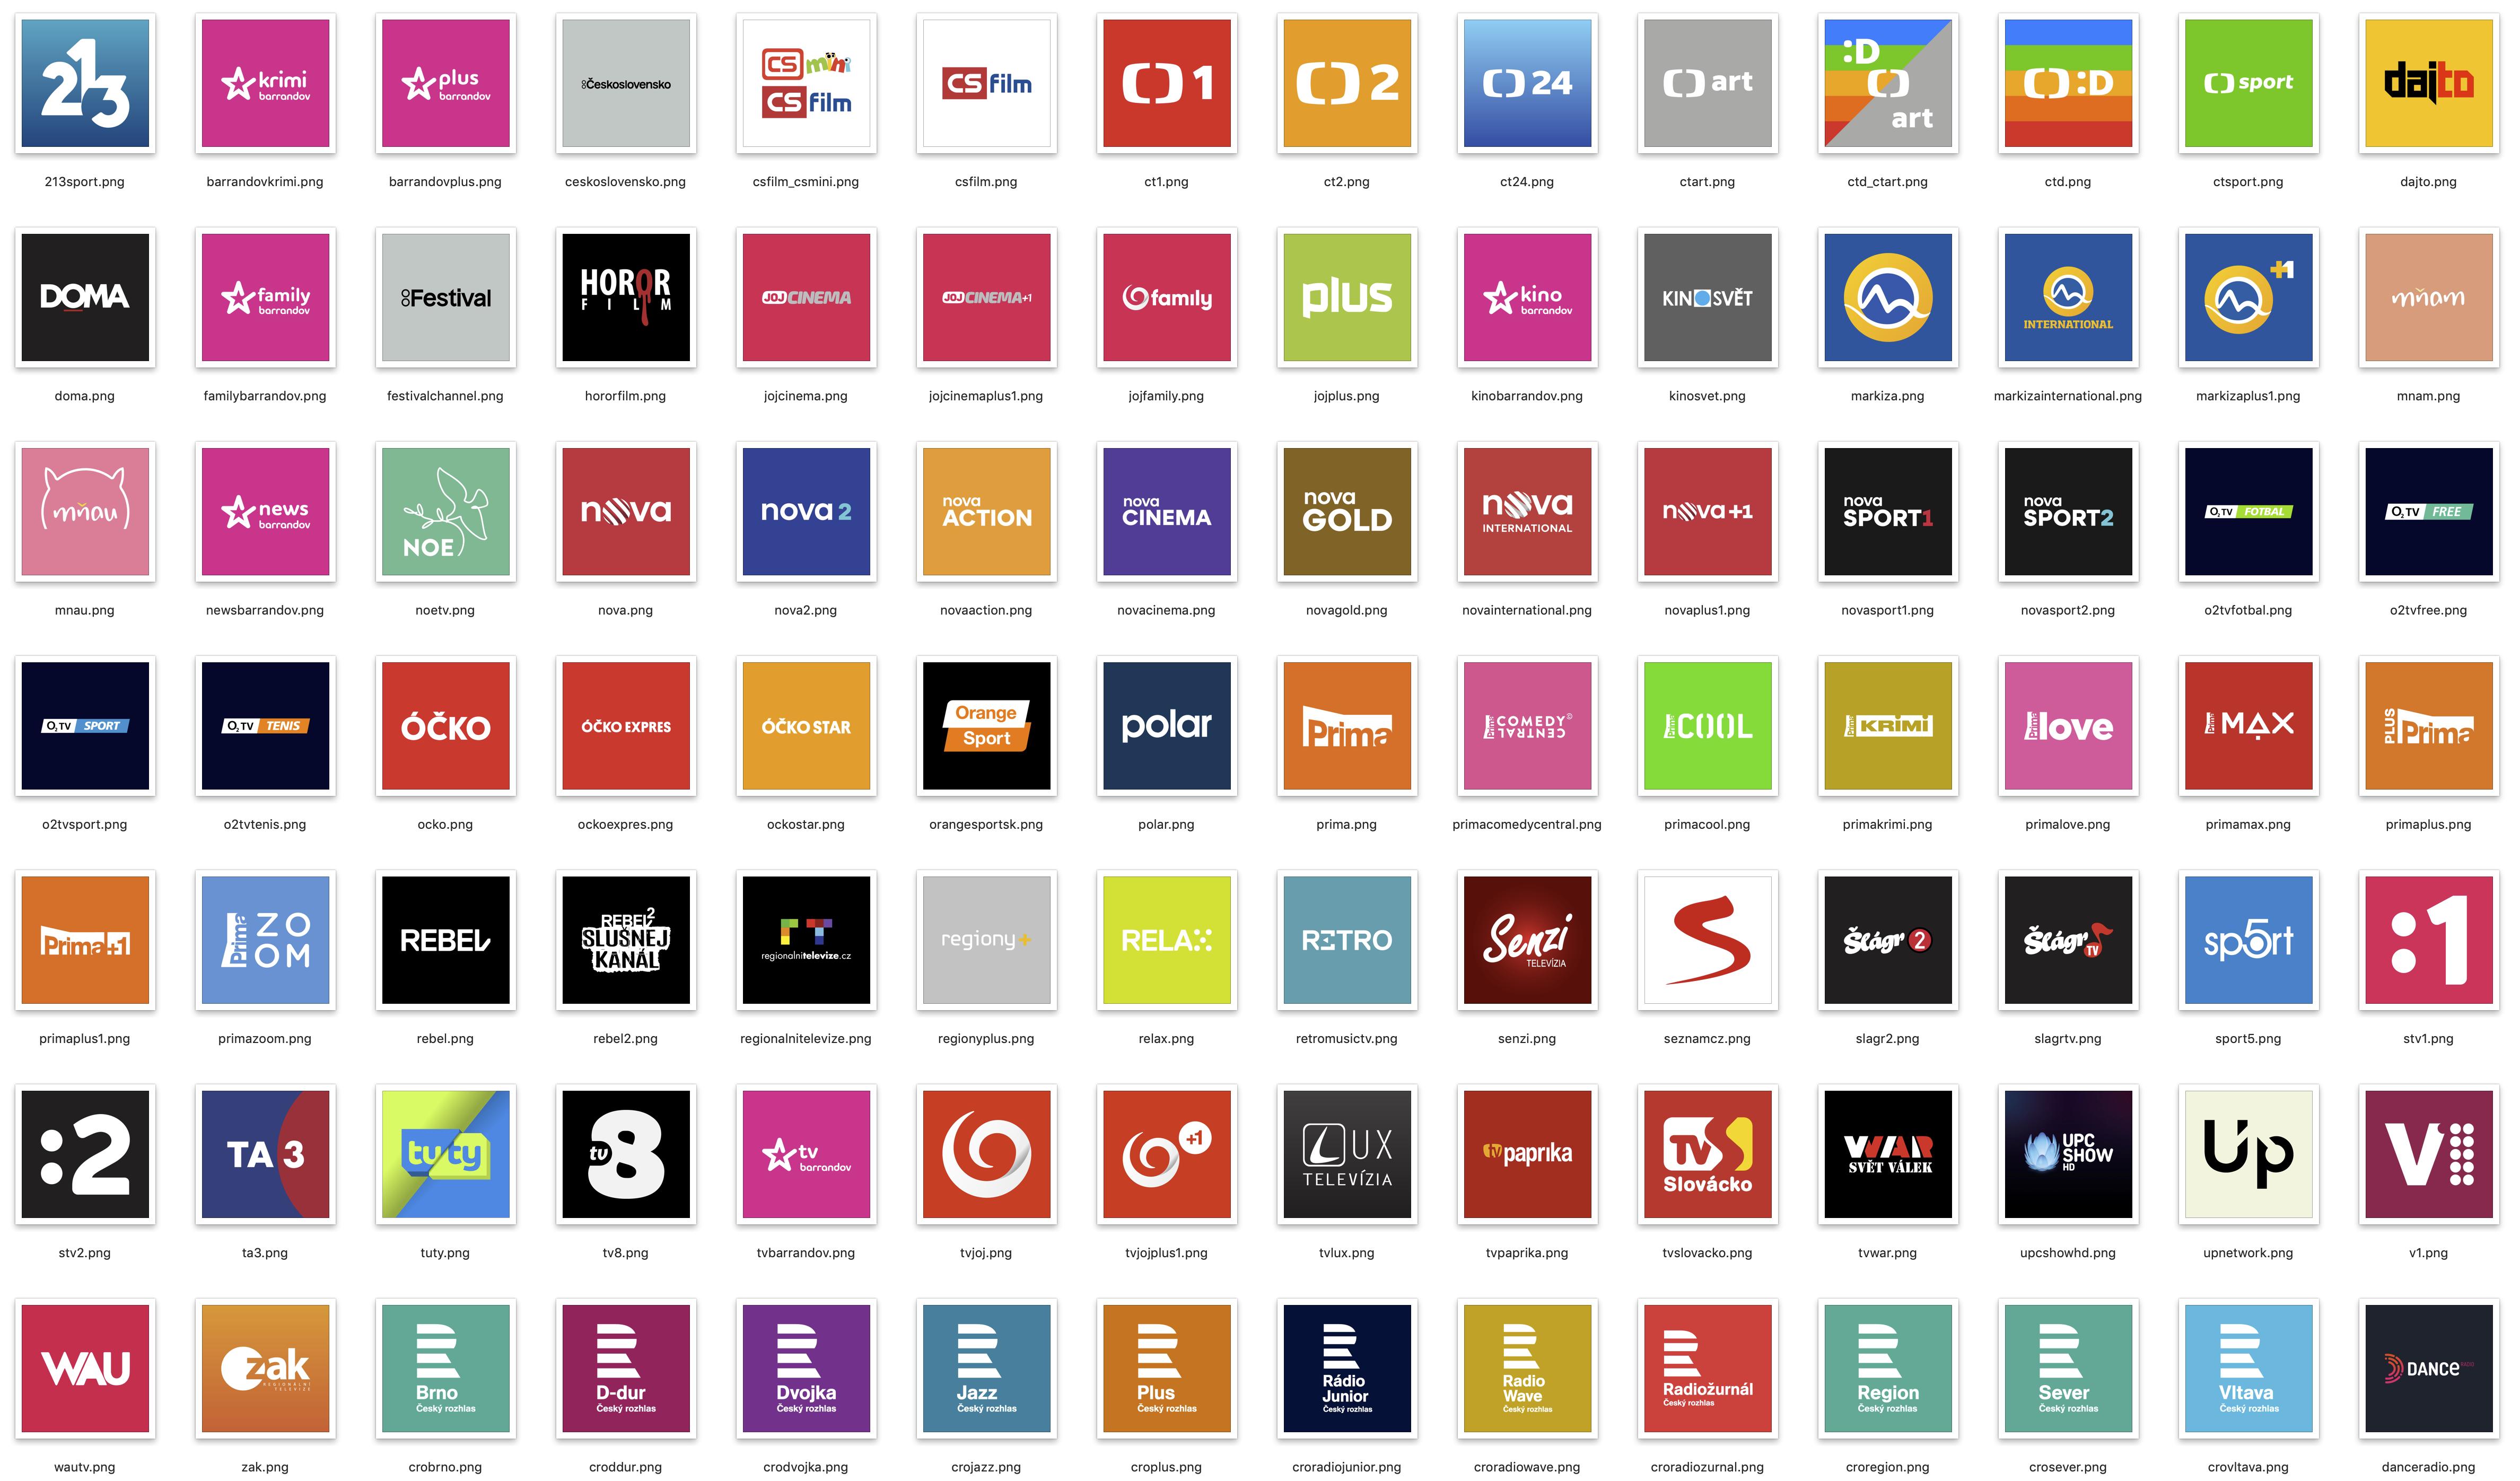 GitHub - MarhyCZ/picons: High quality TV Picons @ Icons by MarhyCZ